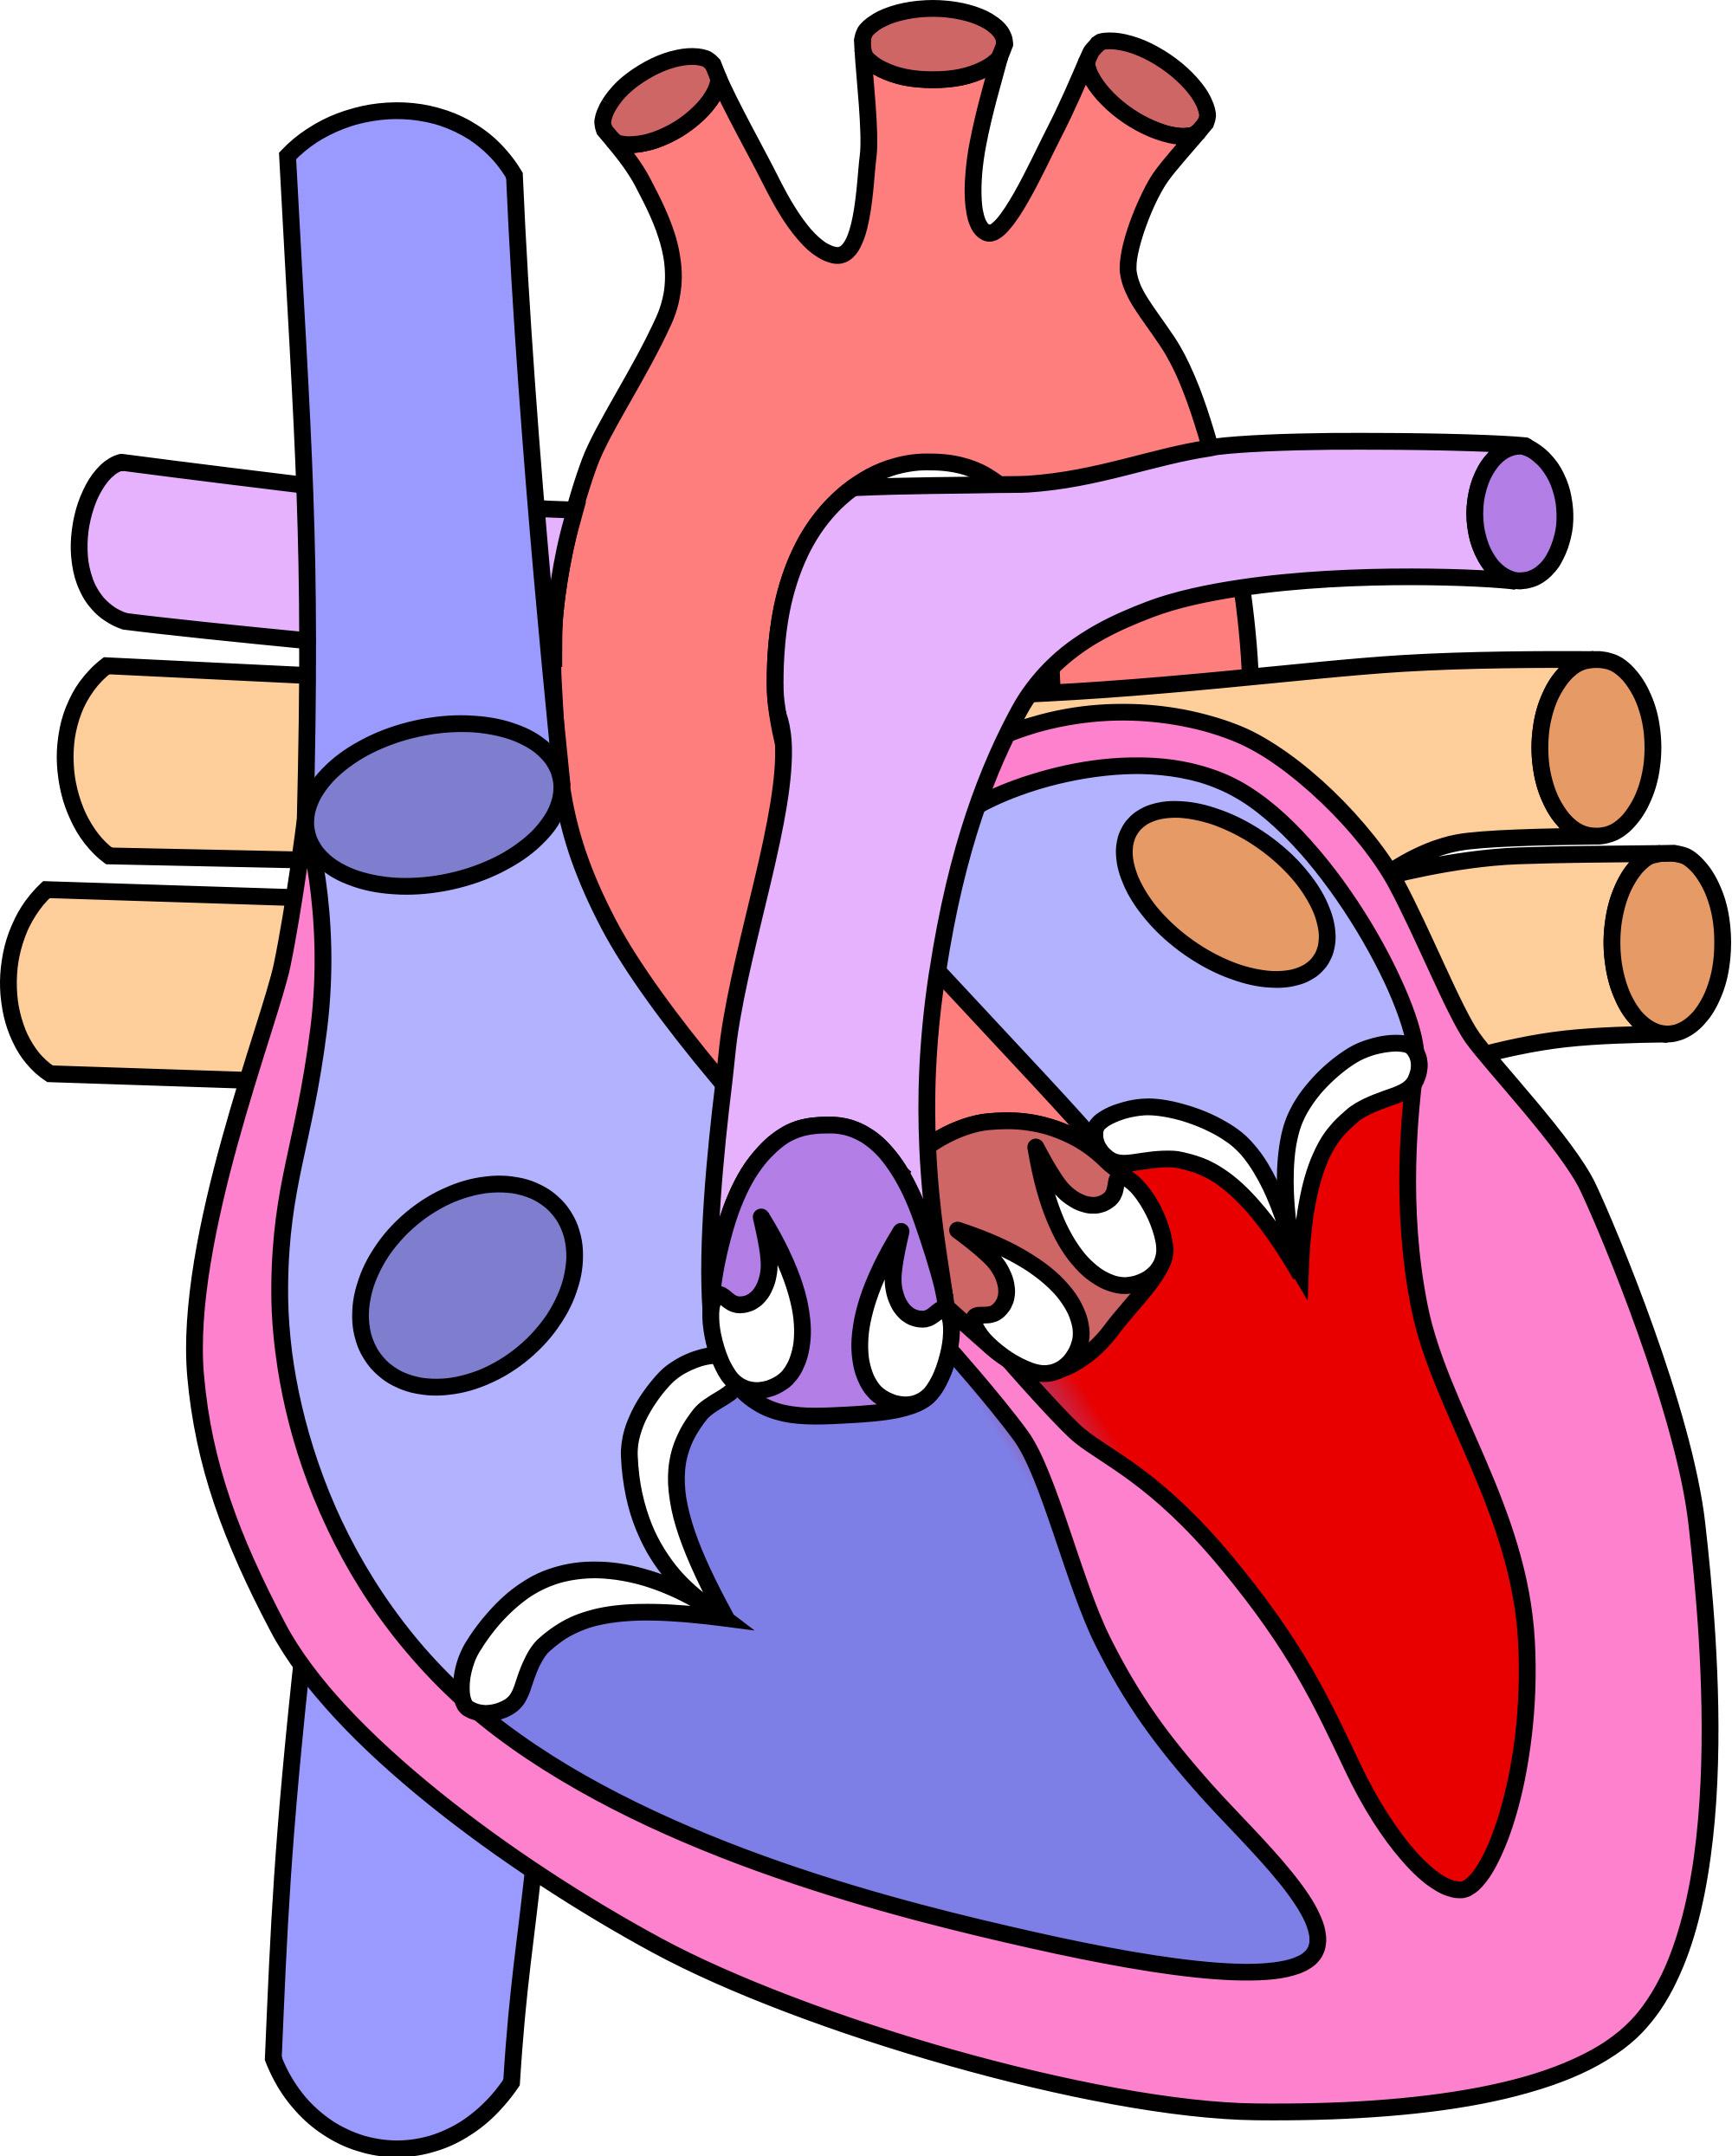 Procesos de decisión en la antiagregación (IV): Síndrome Coronario Agudo